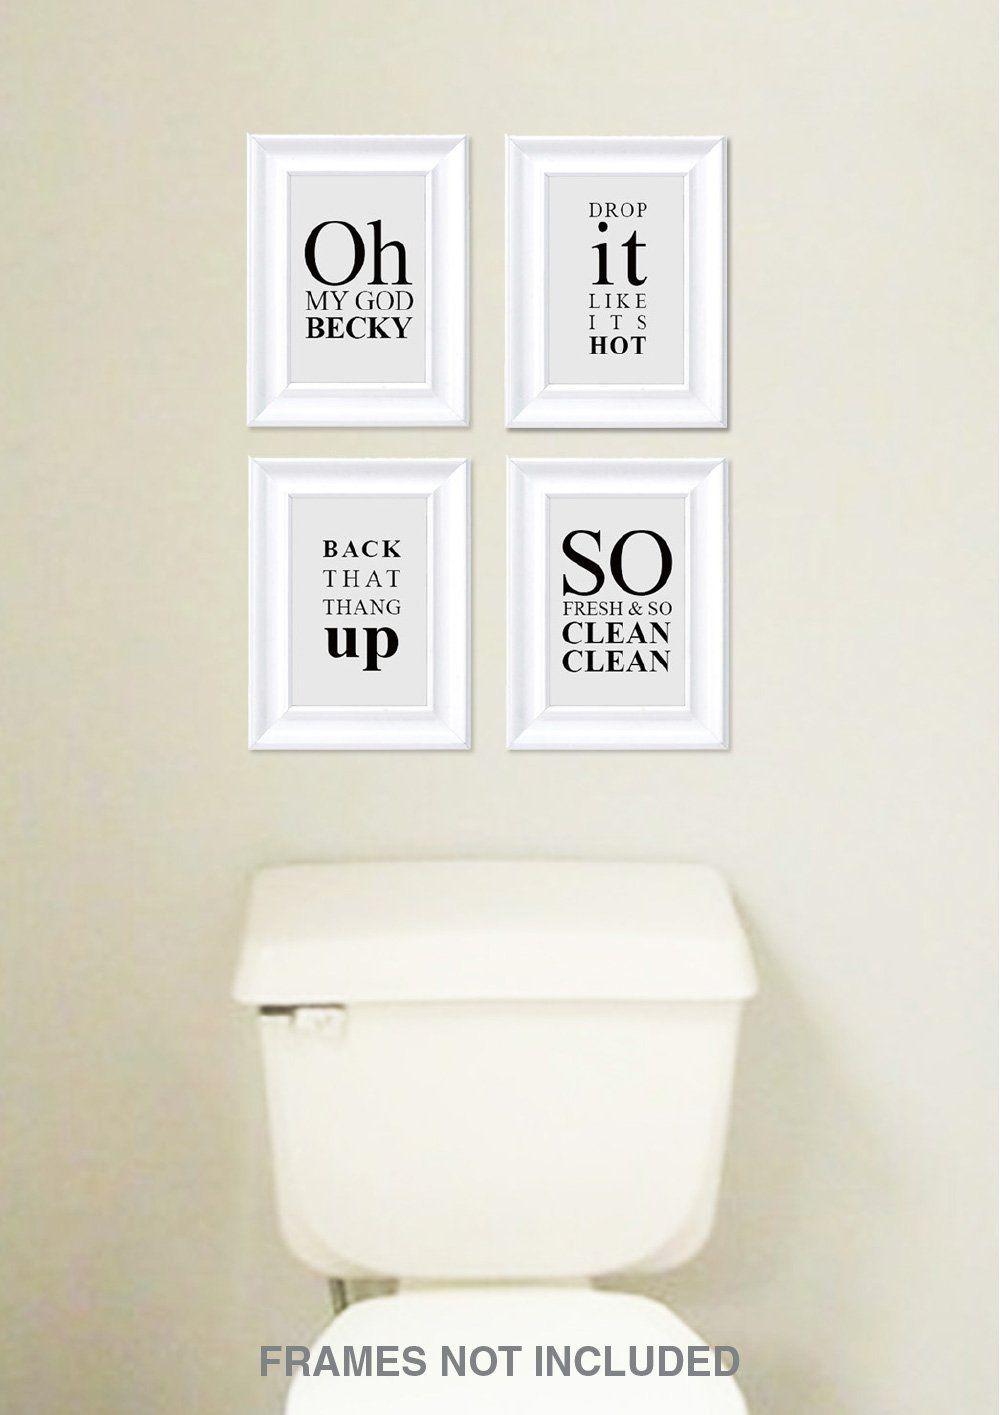 Funny Sayings Bathroom Wall Art Decor Photo Rap Song Lyric Quotes Decoration Signs Bathroom Wall Decor Art Bathroom Wall Decor Diy Bathroom Wall Art Printables